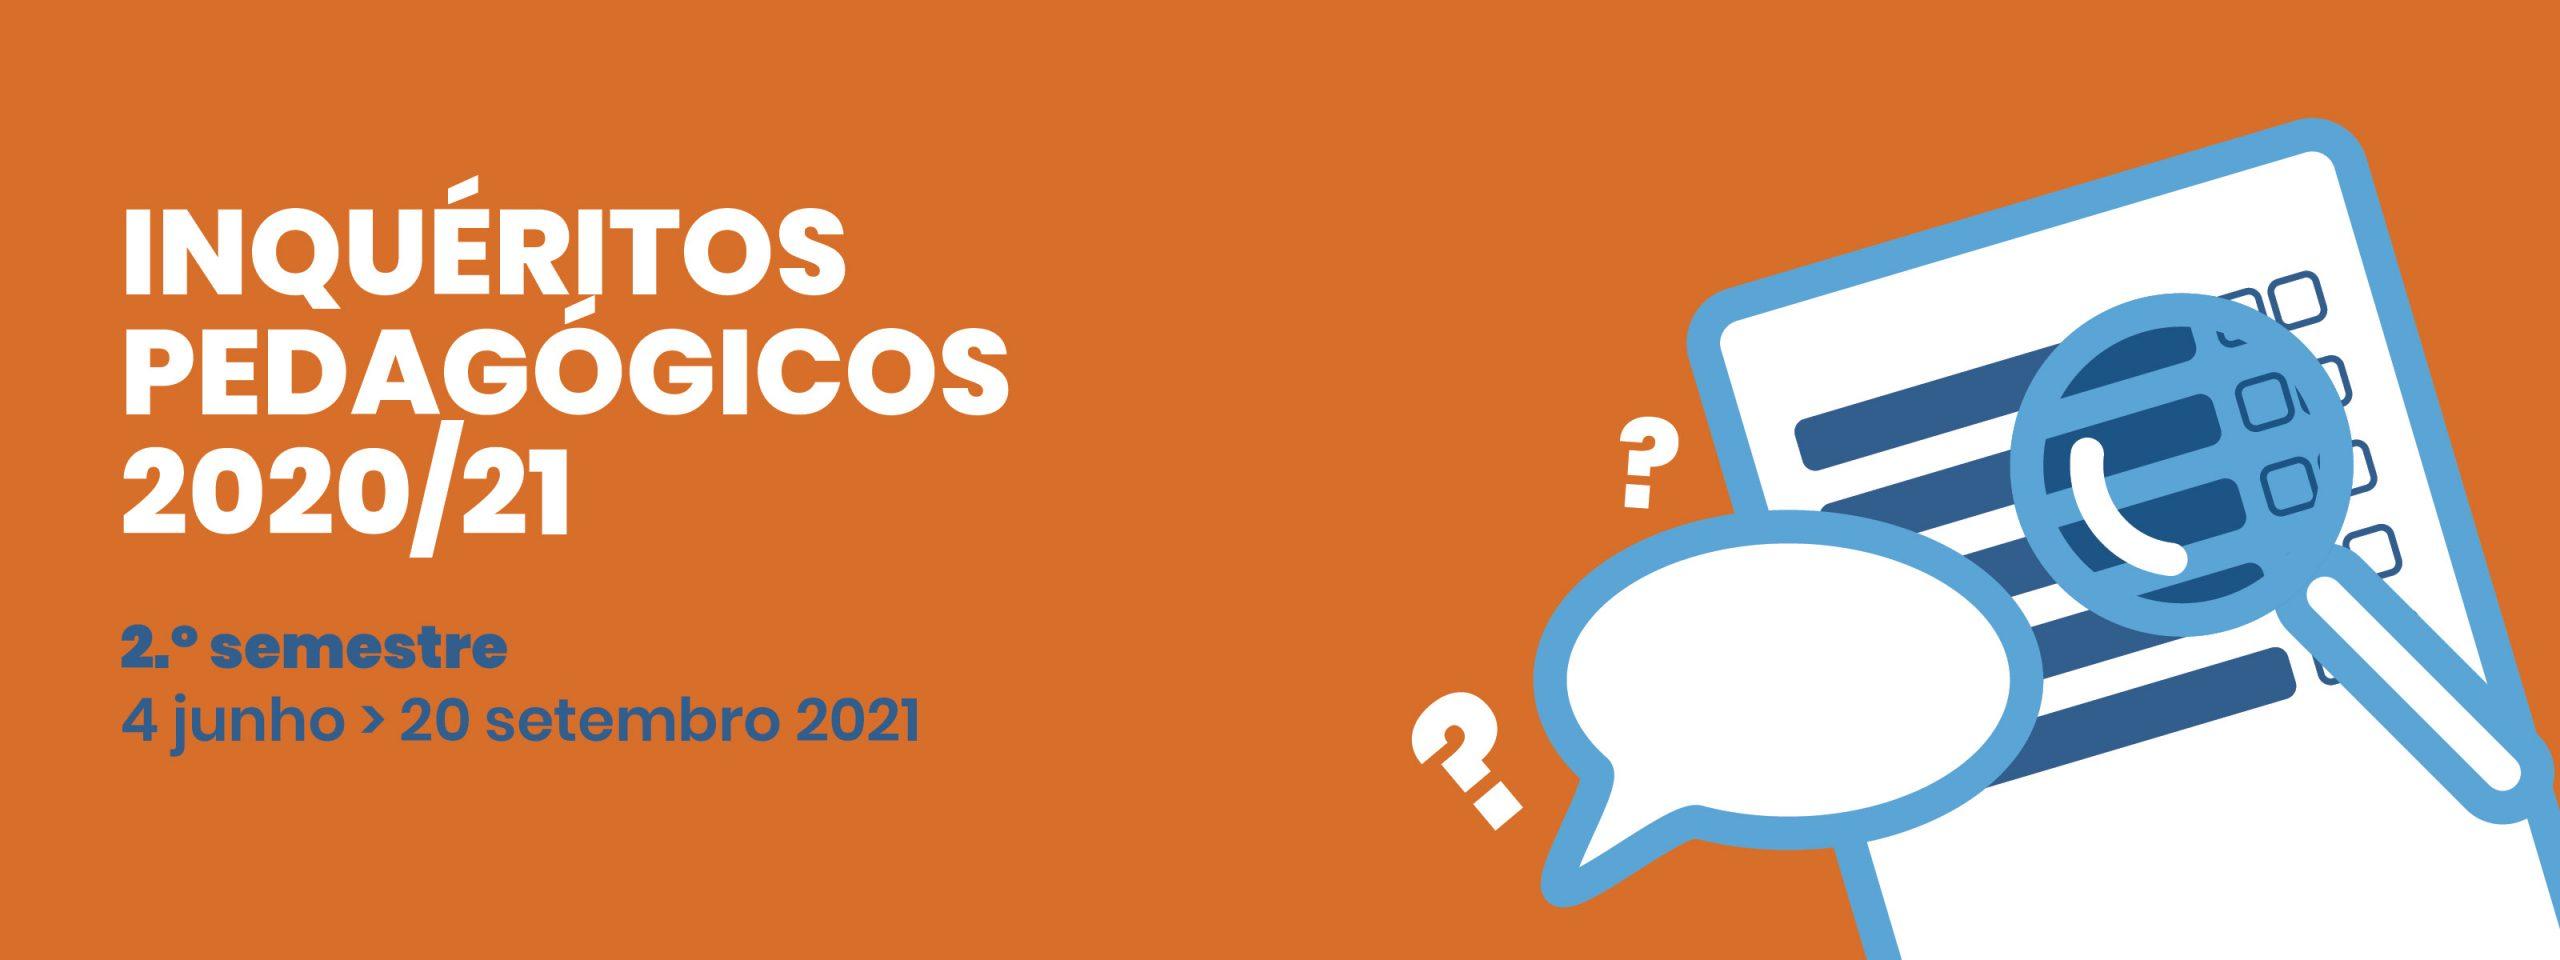 IPUPs 2º semestre 2020/2021